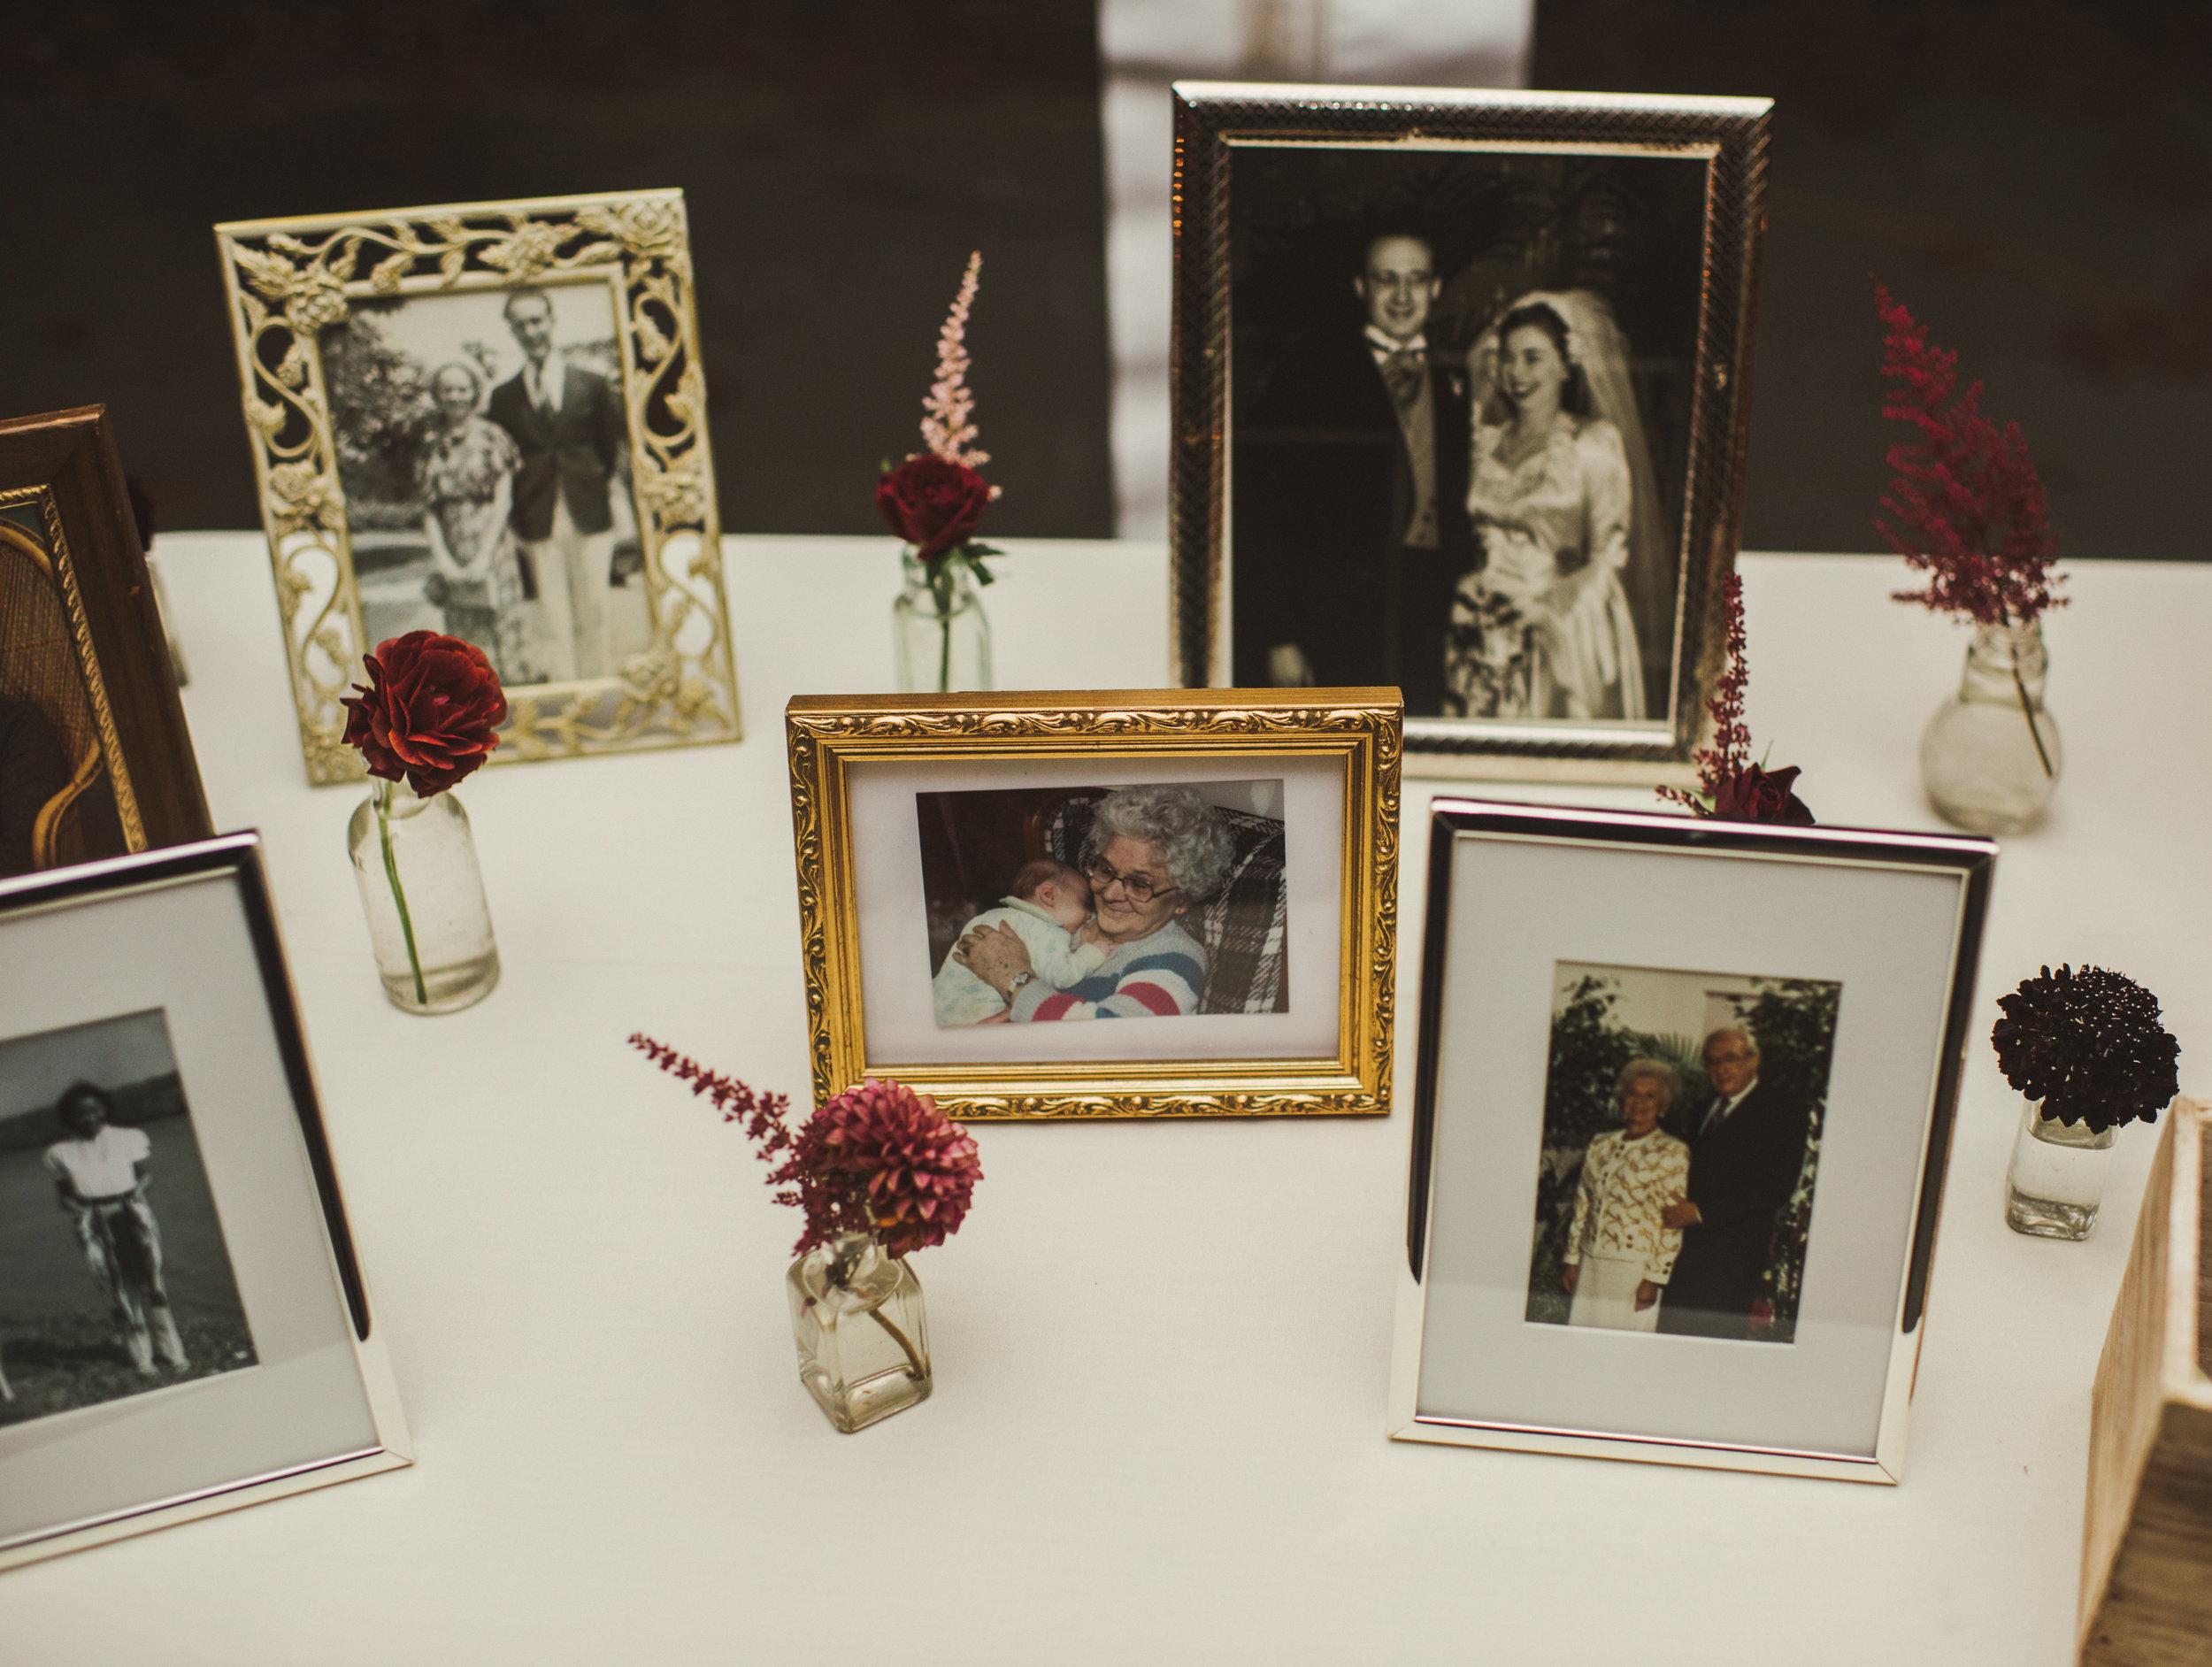 JACQUELINE & ANDREW WARSHAWER -BROOKMILL FARM FALL WEDDING - INTIMATE WEDDING PHOTOGRAPHER - TWOTWENTY by CHI-CHI AGBIM-576.jpg